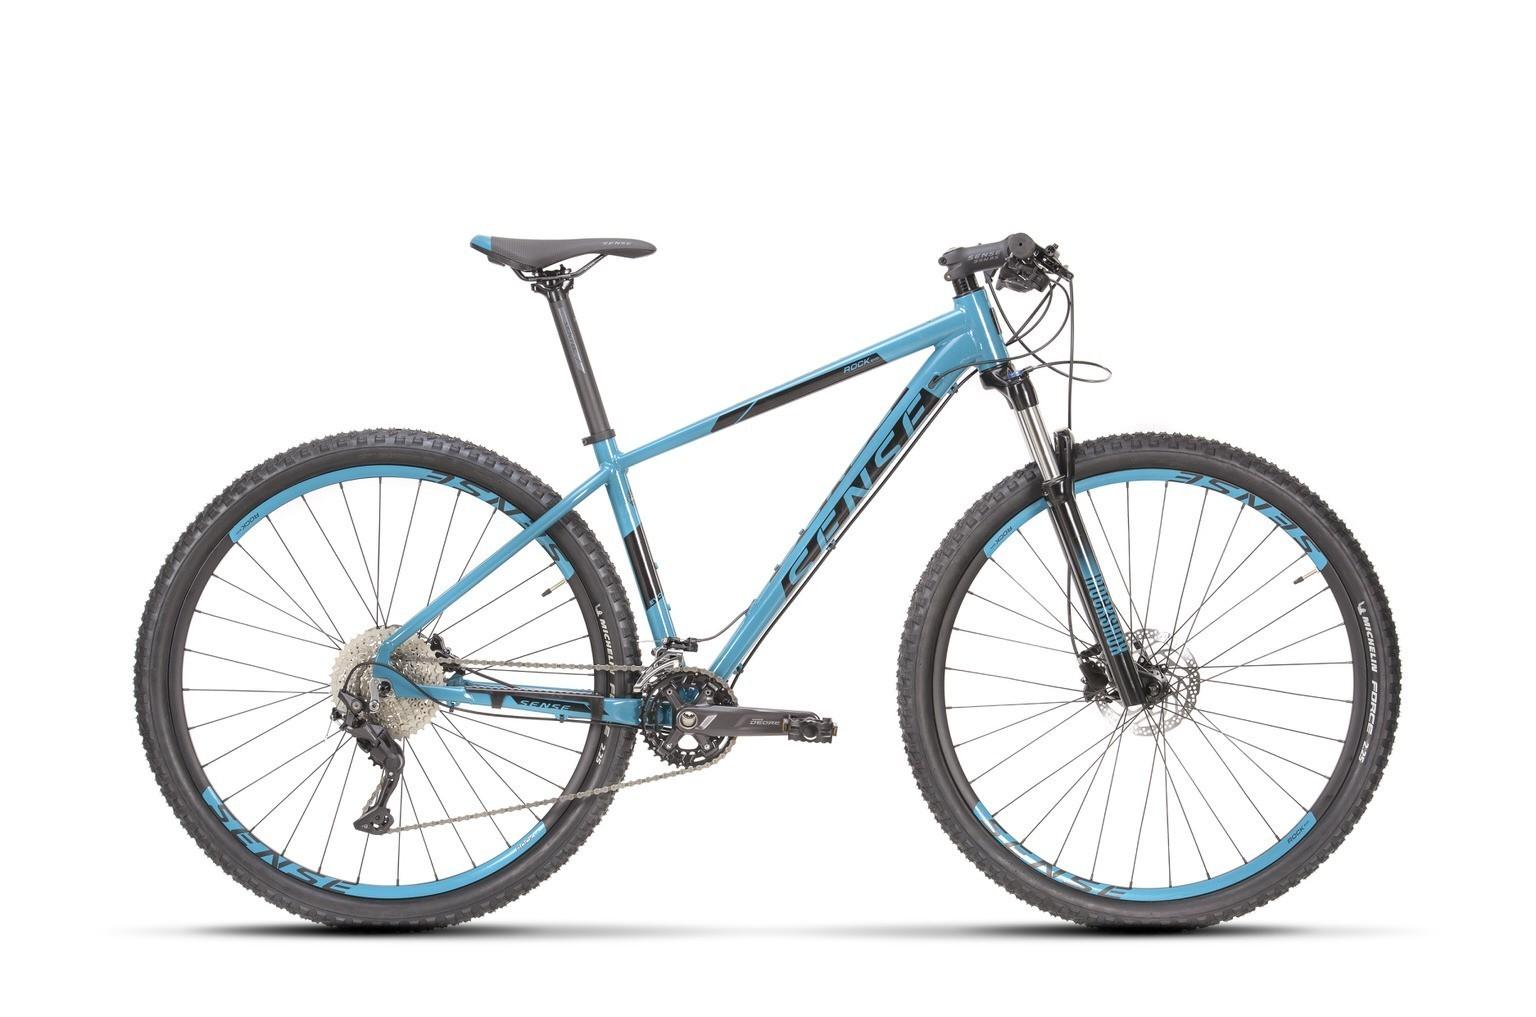 Bicicleta Sense Rock Evo 2021/22 Azul preto  Deore Rockshox